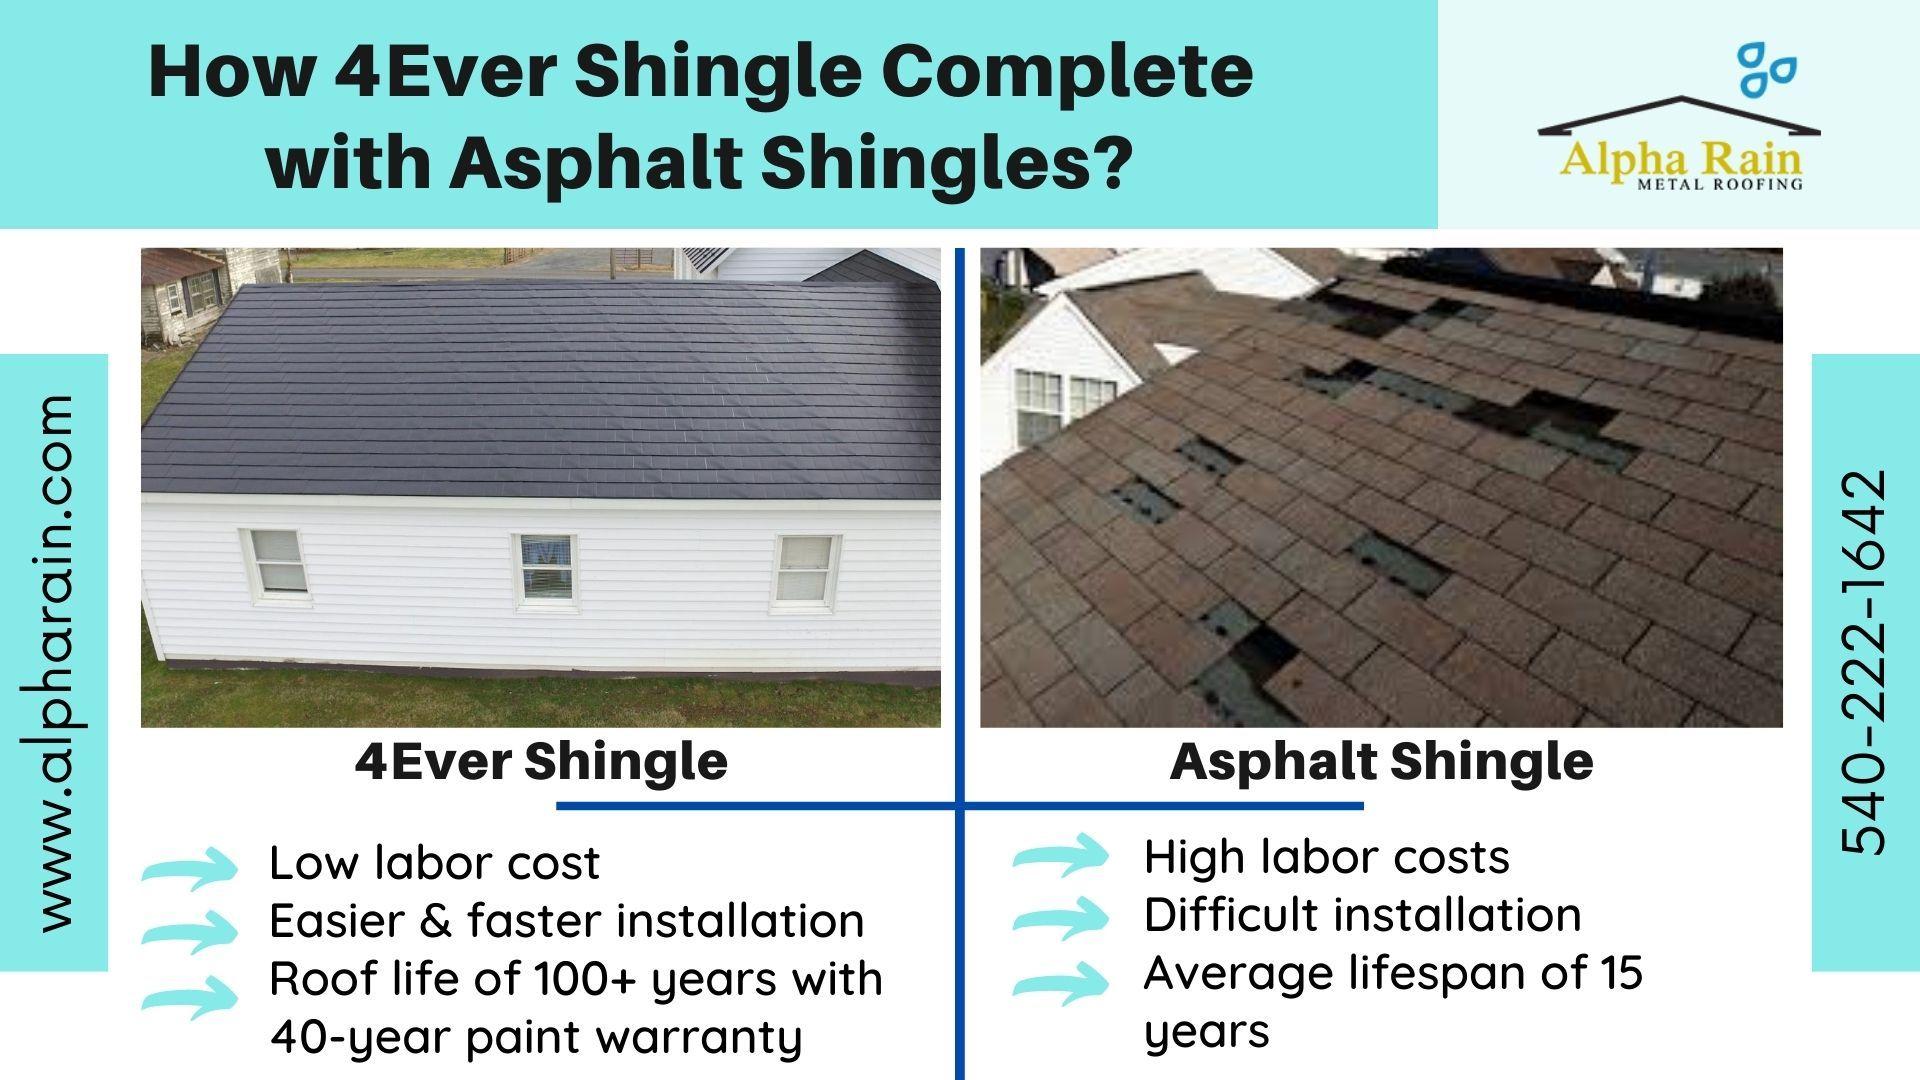 4ever Metal Shingle Installation Cost Vs Asphalt Shingles Cost In 2020 Shingling Installing Shingles Metal Shingles